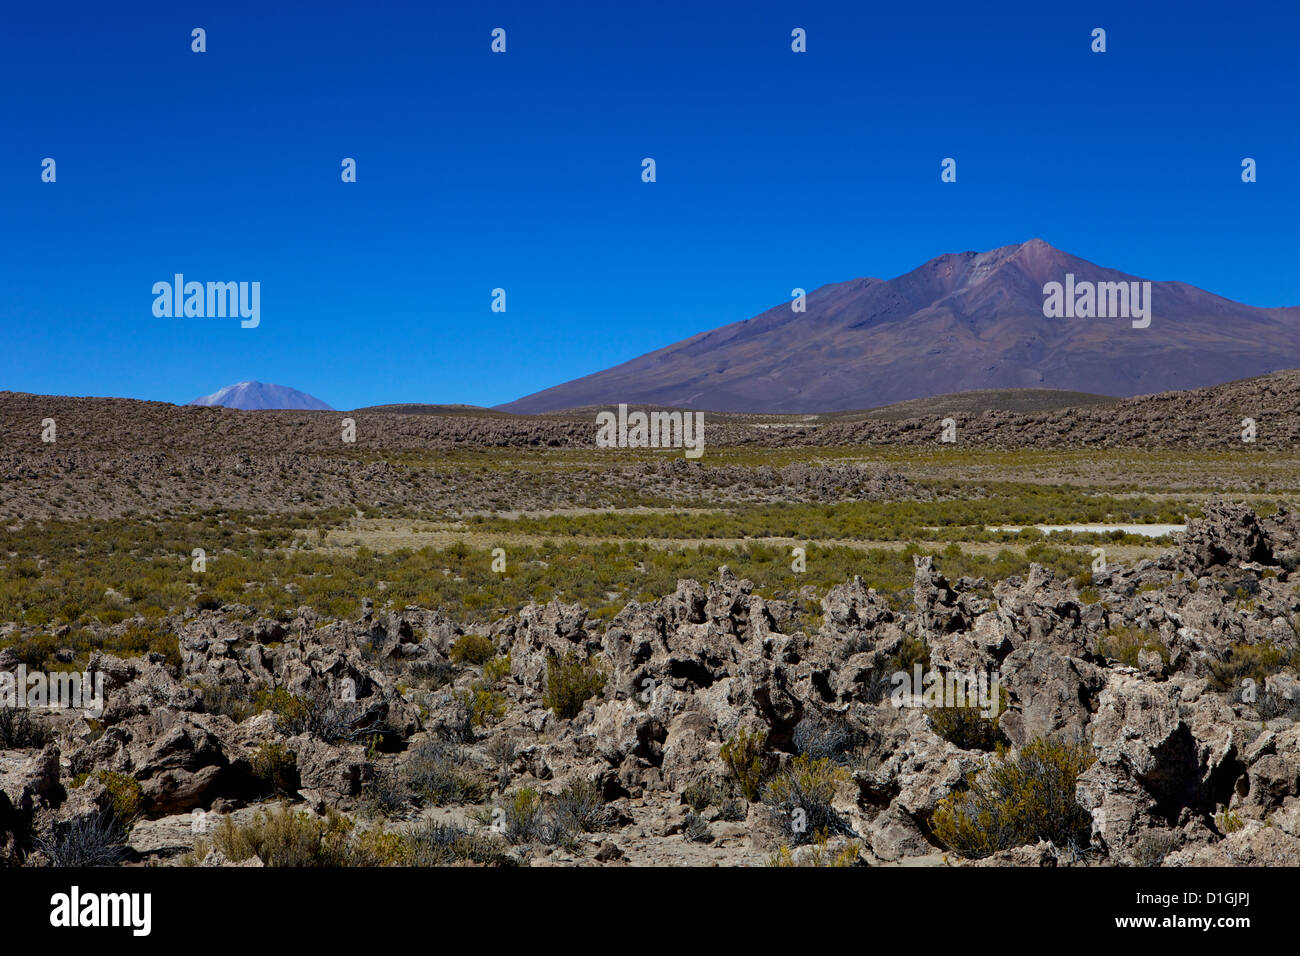 Southwest Highlands, Bolivia, South America - Stock Image